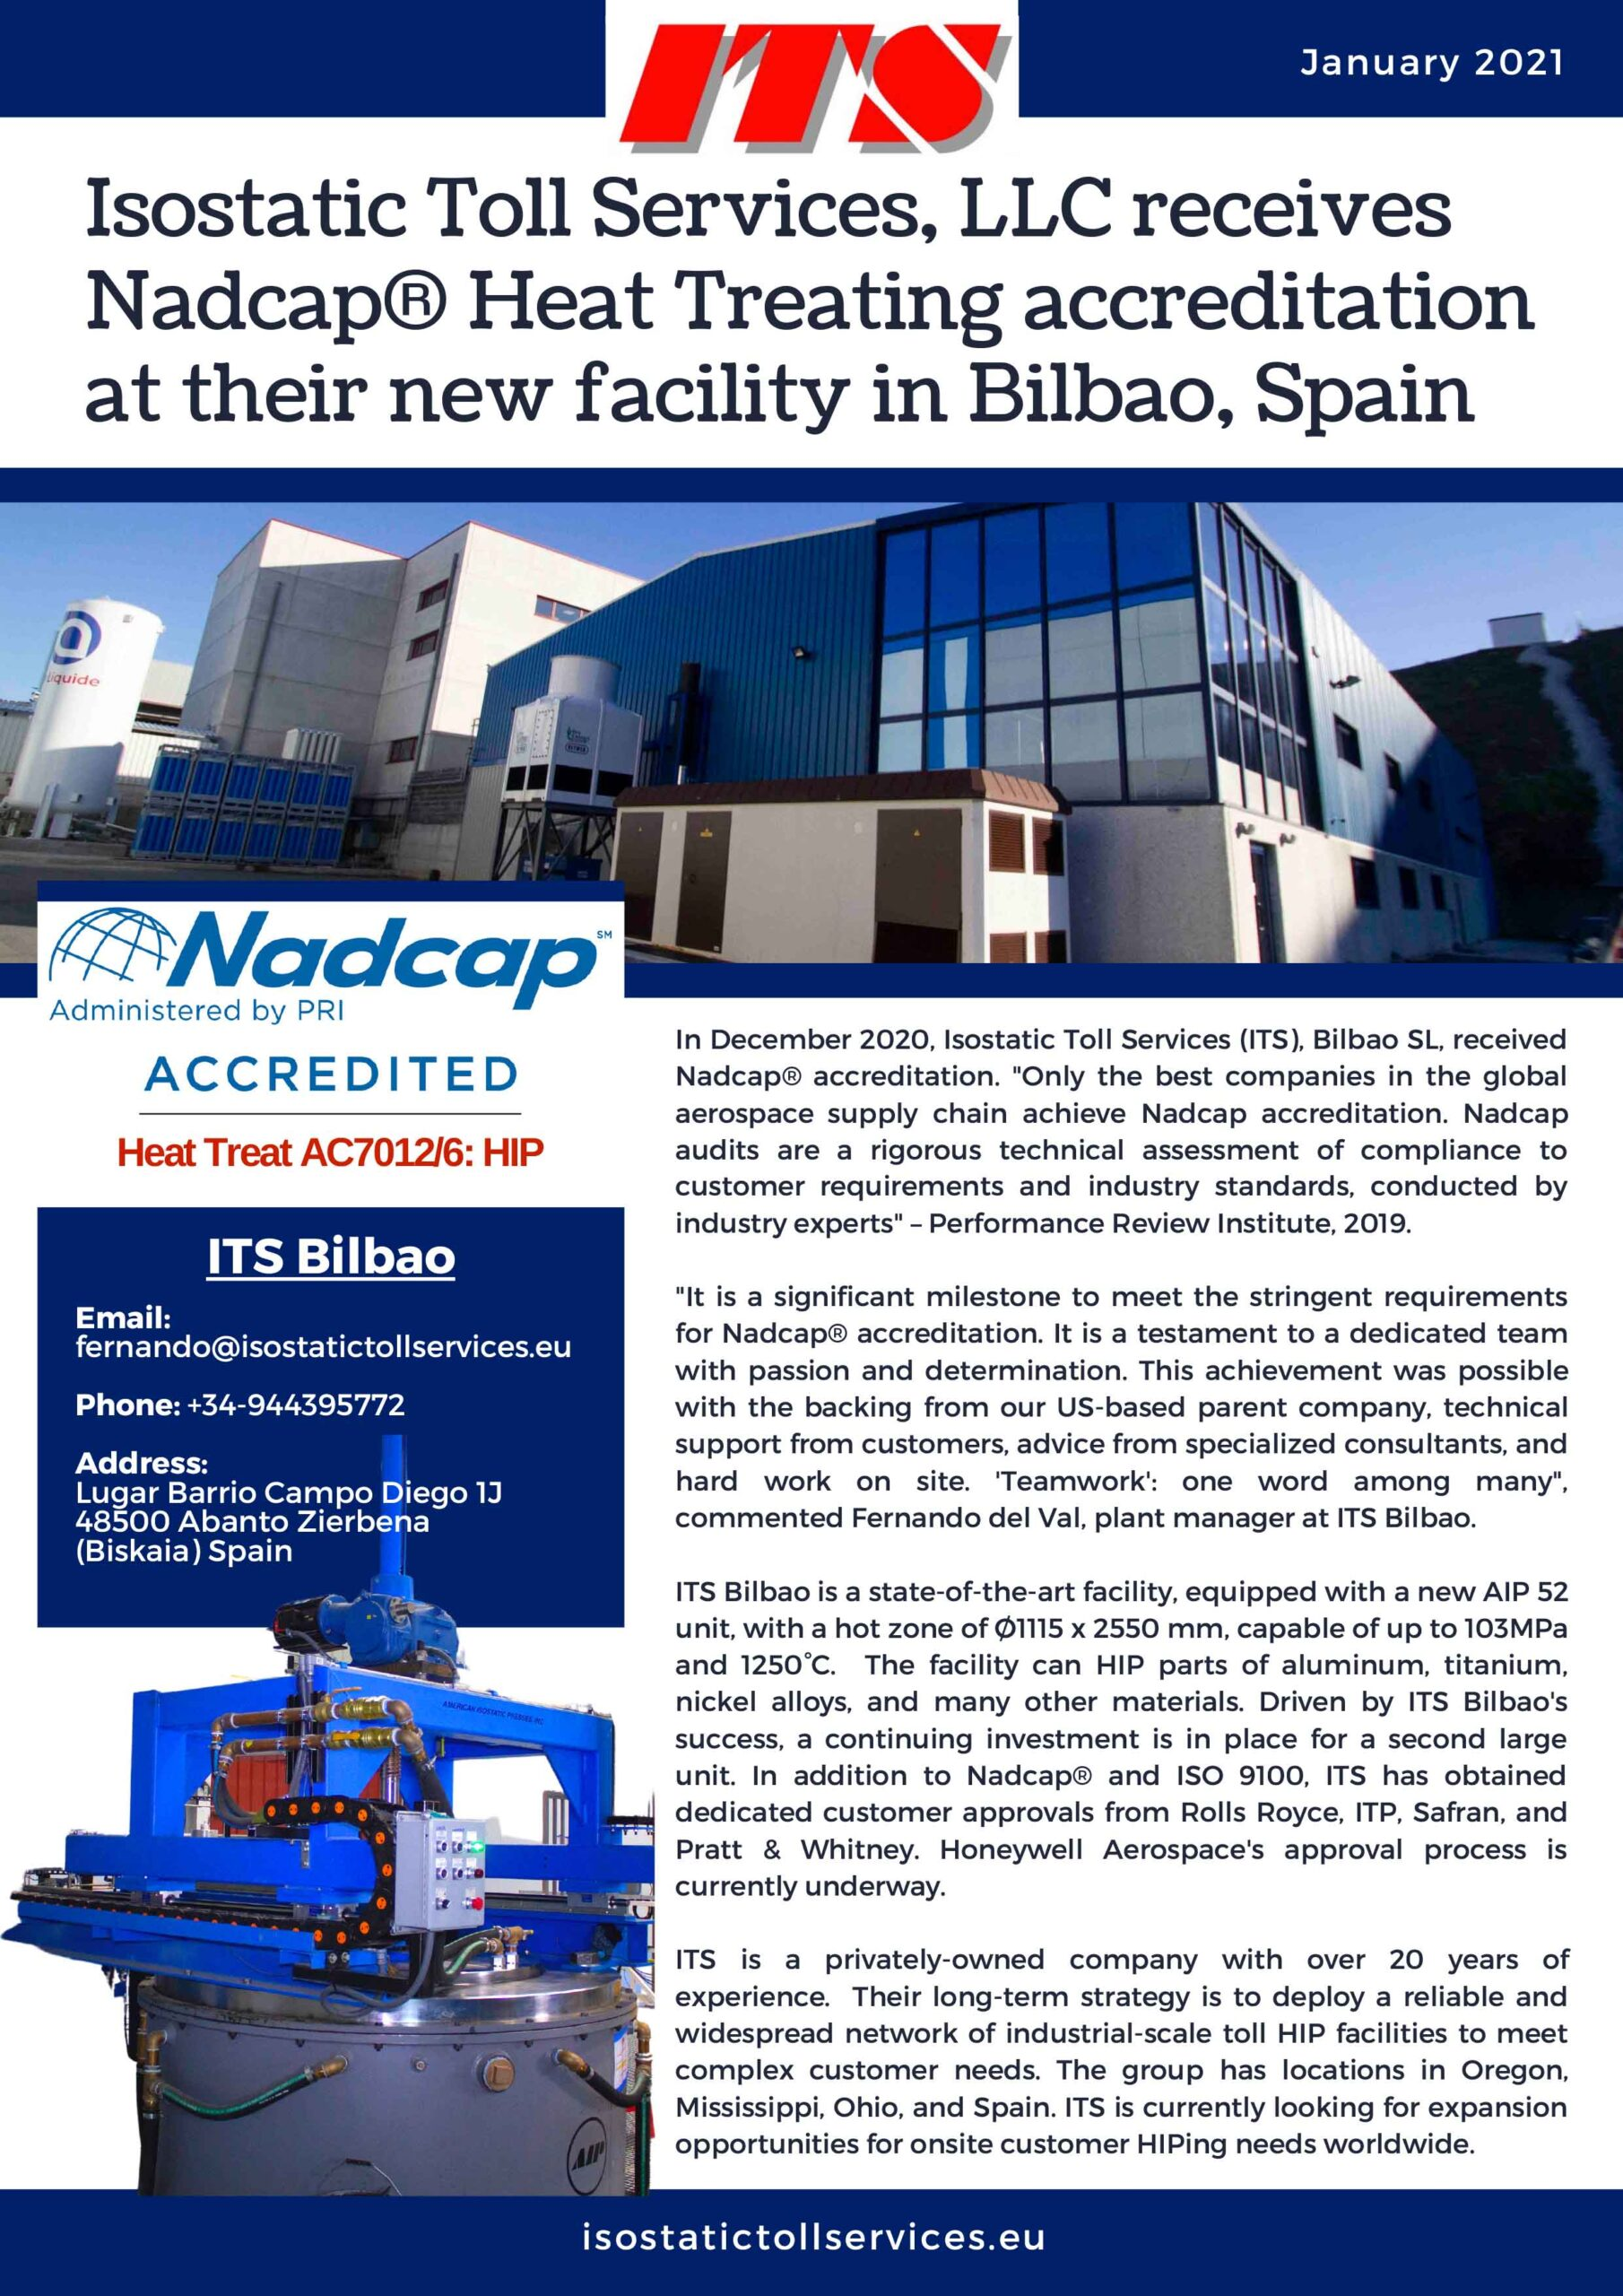 ITS Bilbao Nadcap Newsletter